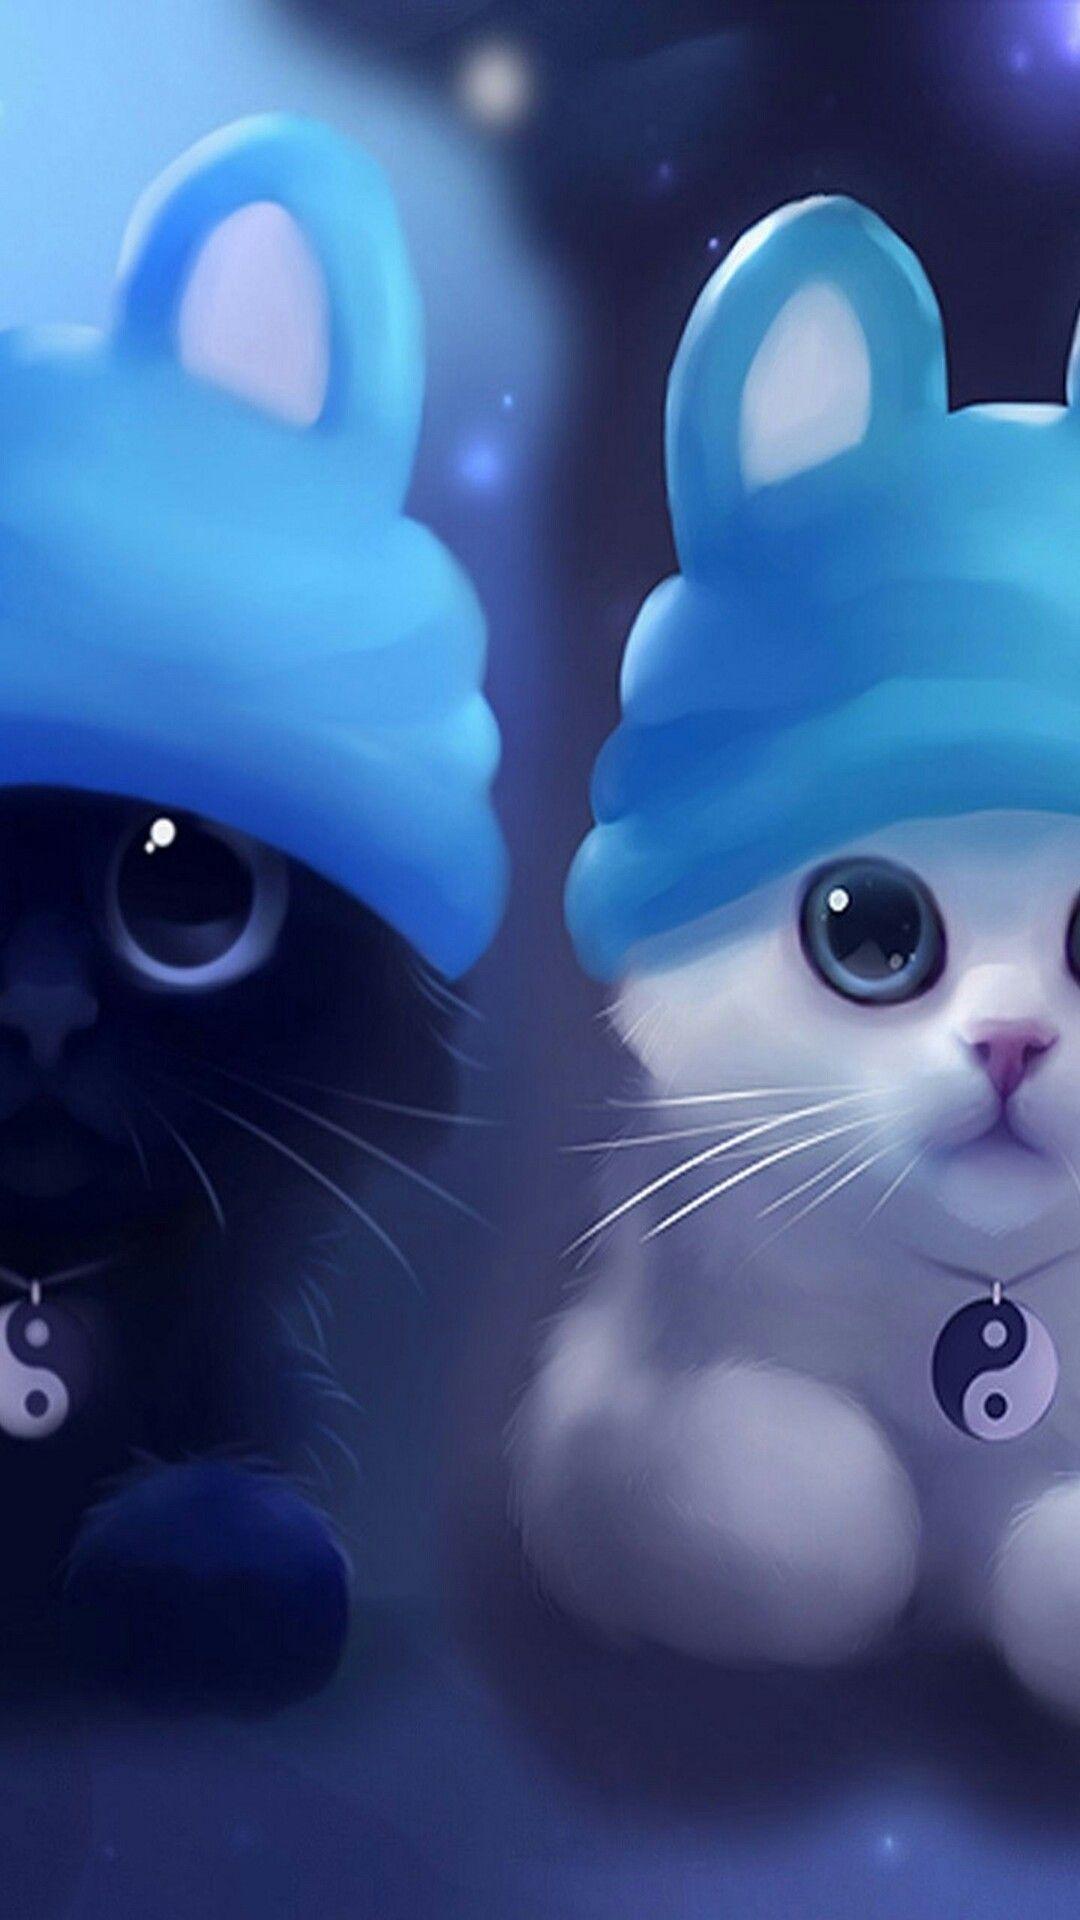 Que Fofinhooosss Animal Wallpaper Iphone Kawaii Fofinhooosss Anime Animals Animal Wallpaper Cute Art